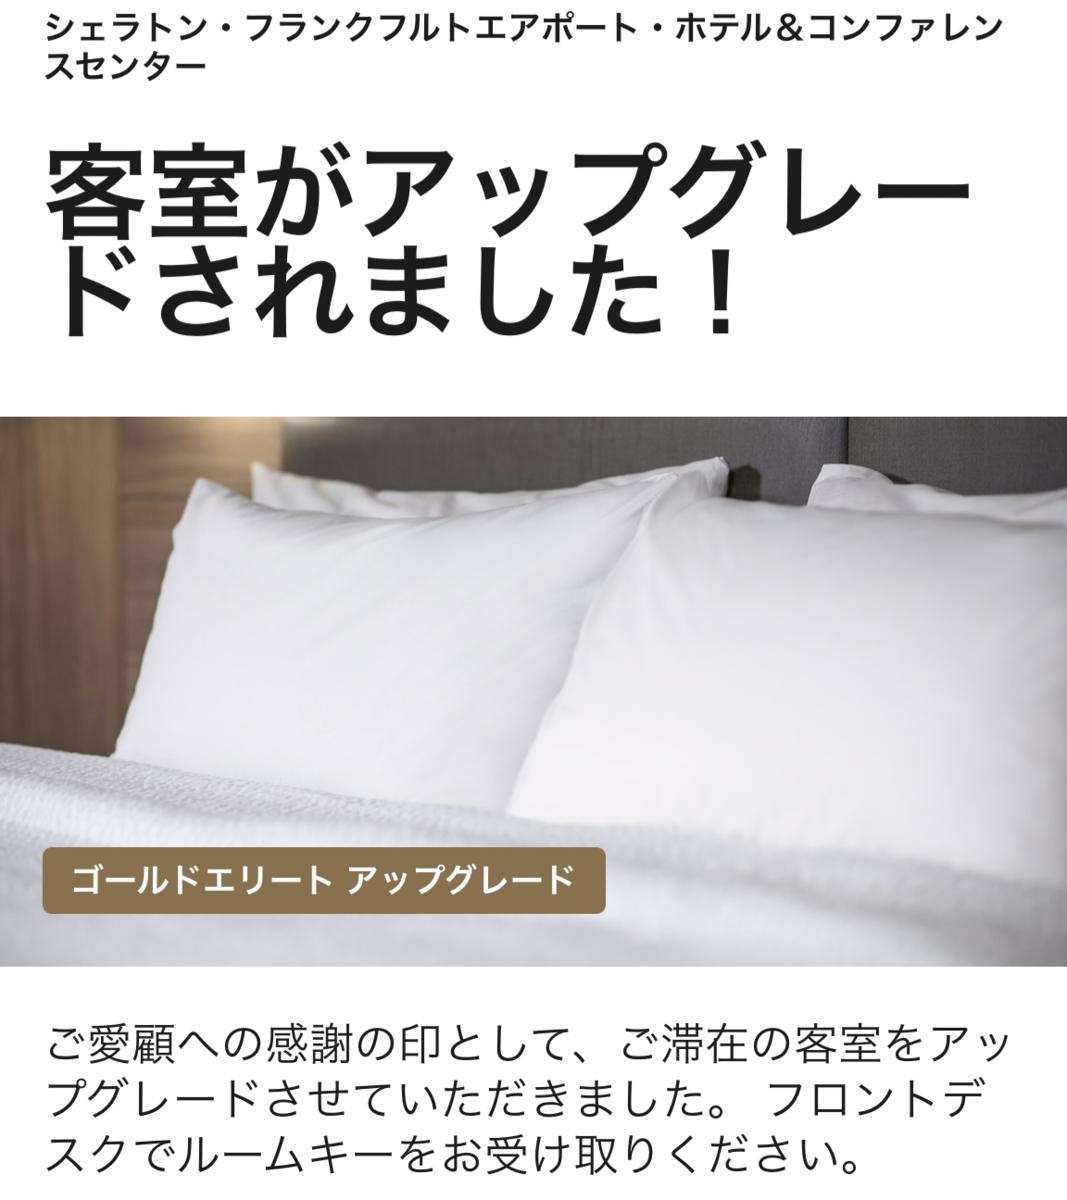 f:id:Nagoya1976:20190630170659p:plain